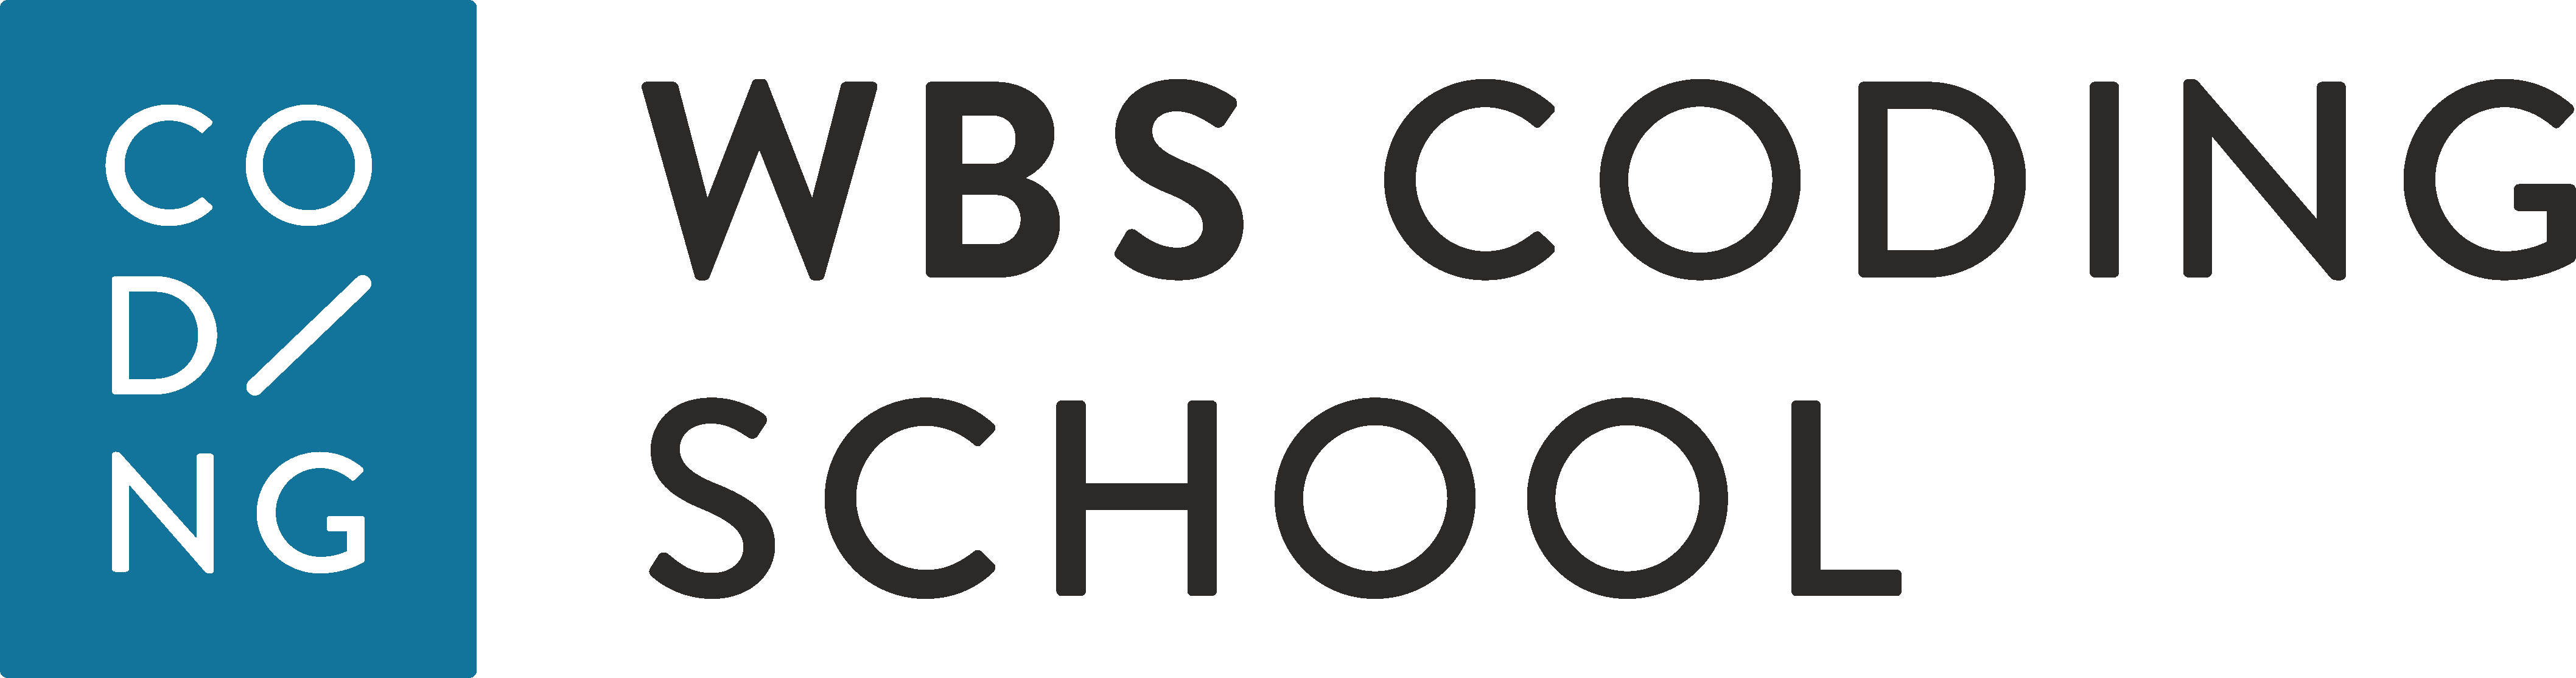 WBS Coding School